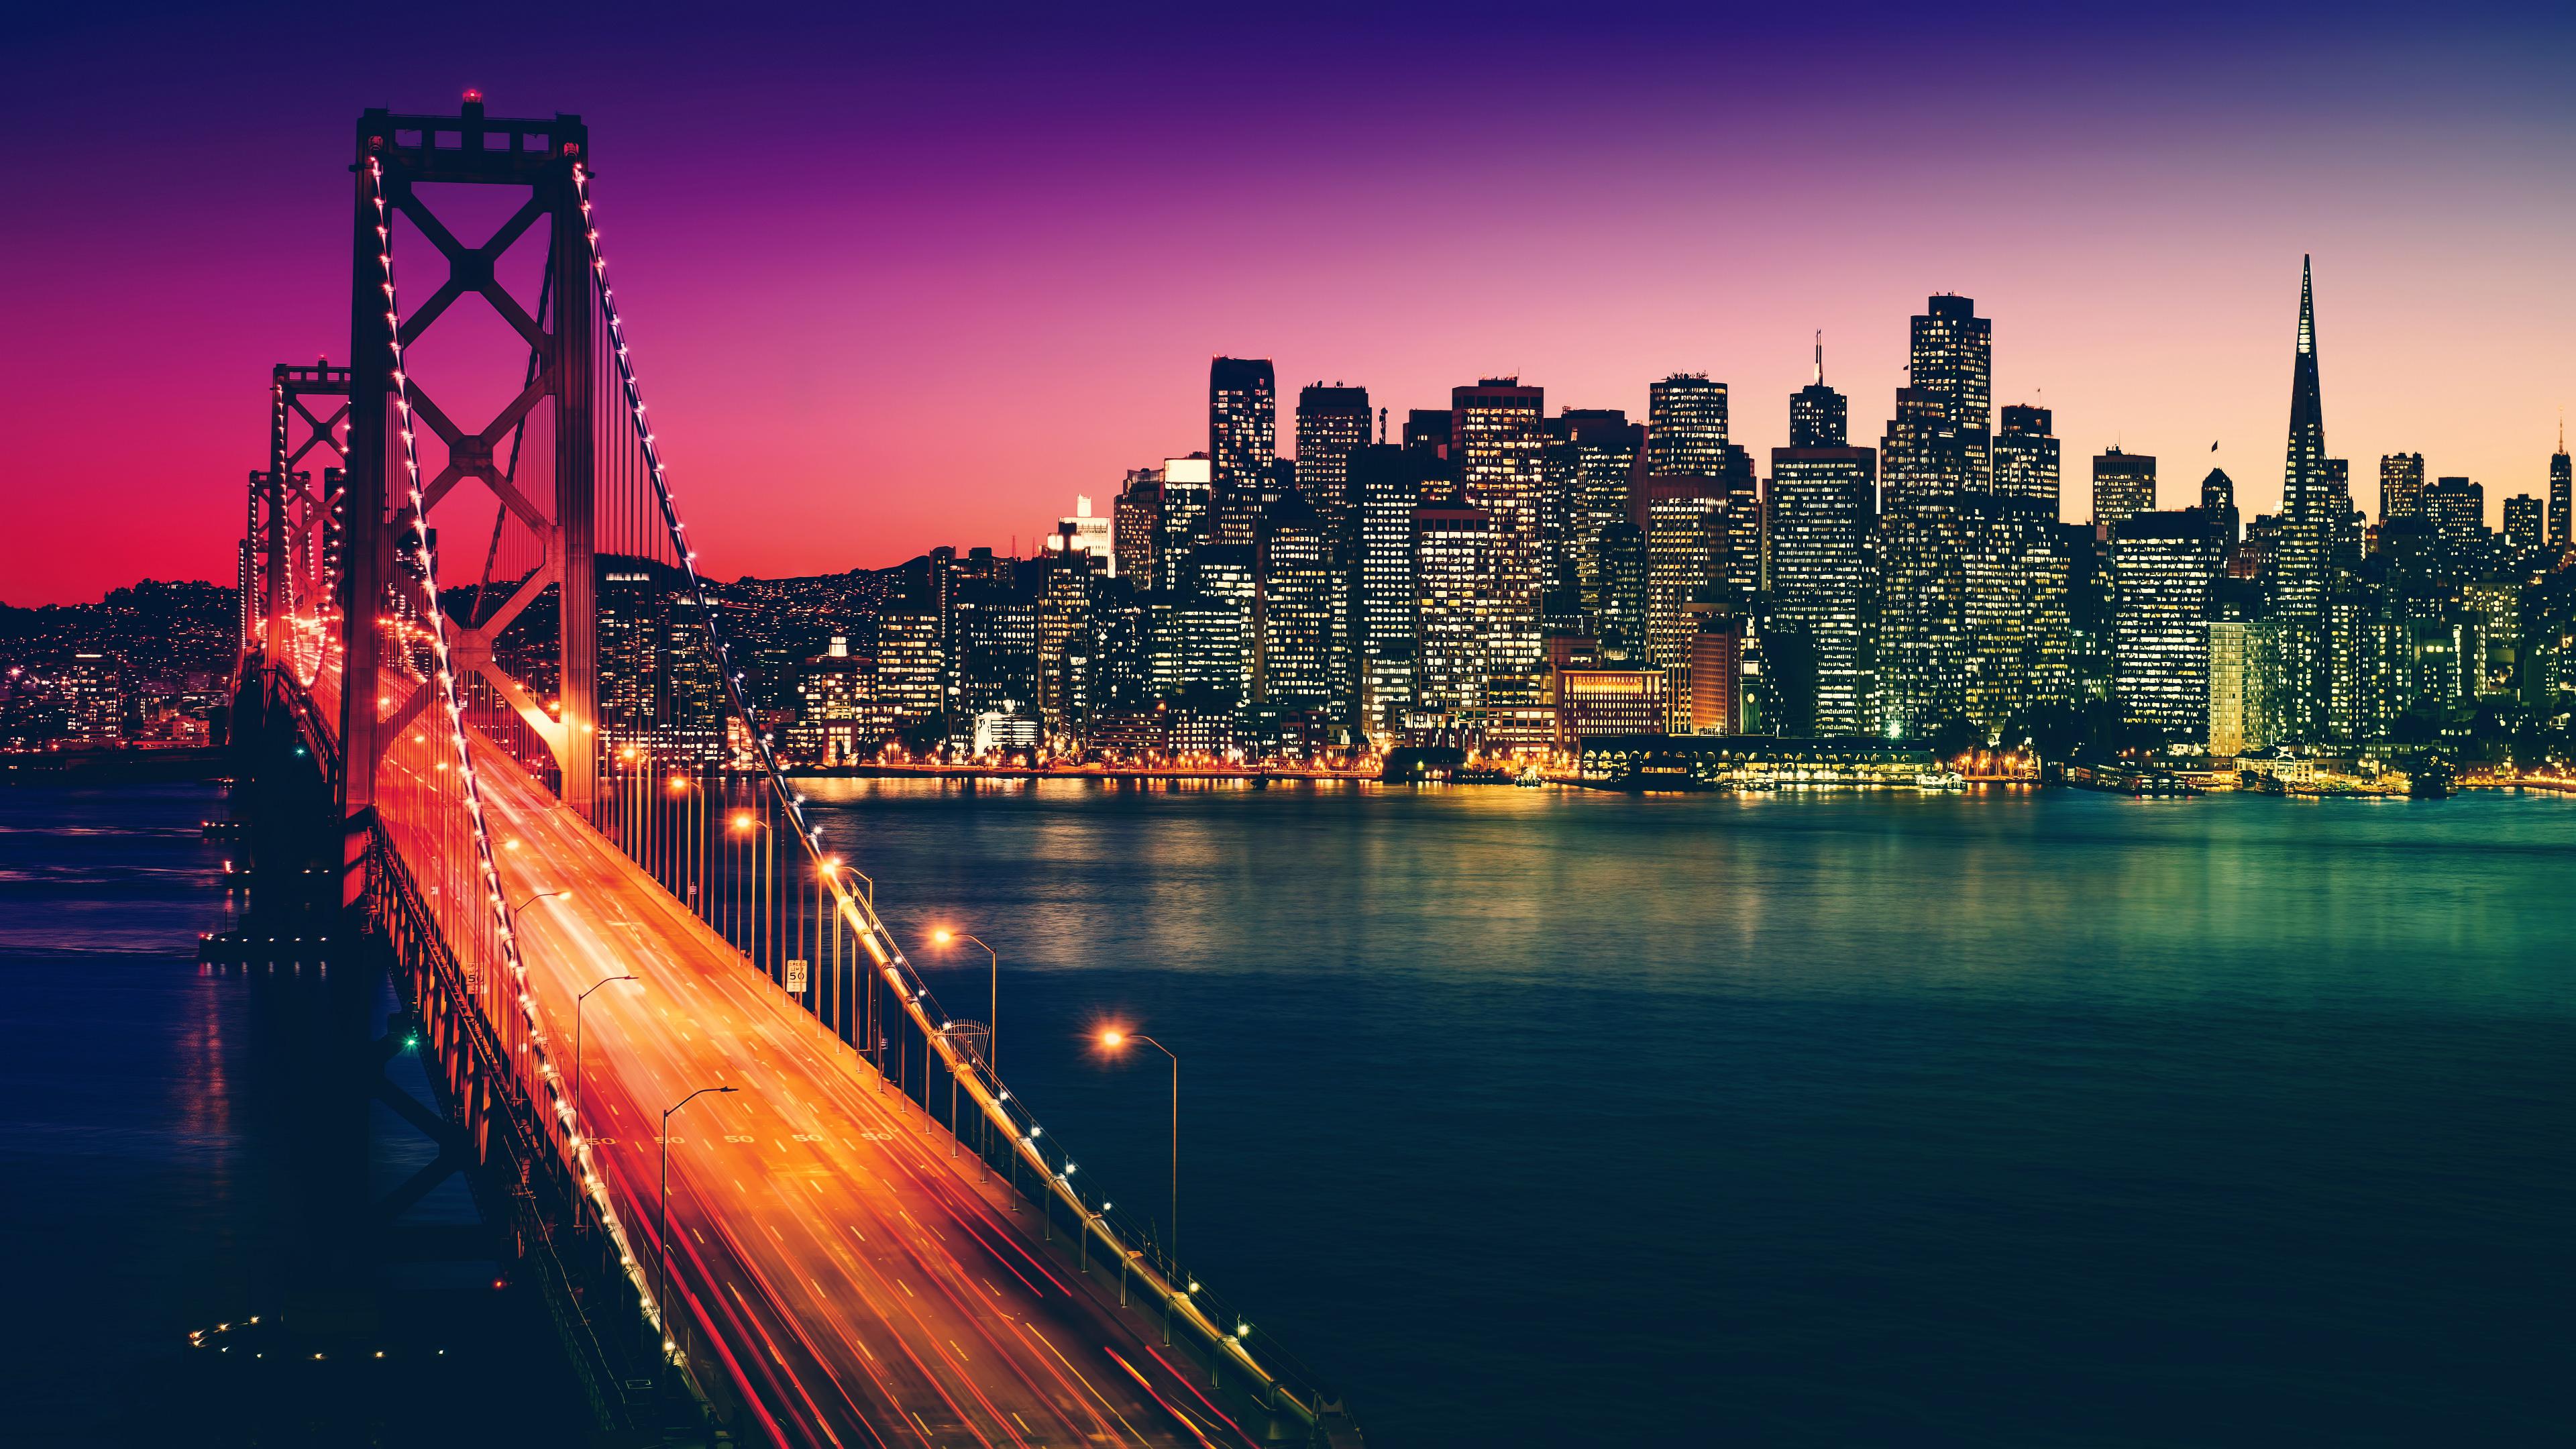 1242x2688 San Francisco California Cityscape 4k Iphone Xs Max Hd